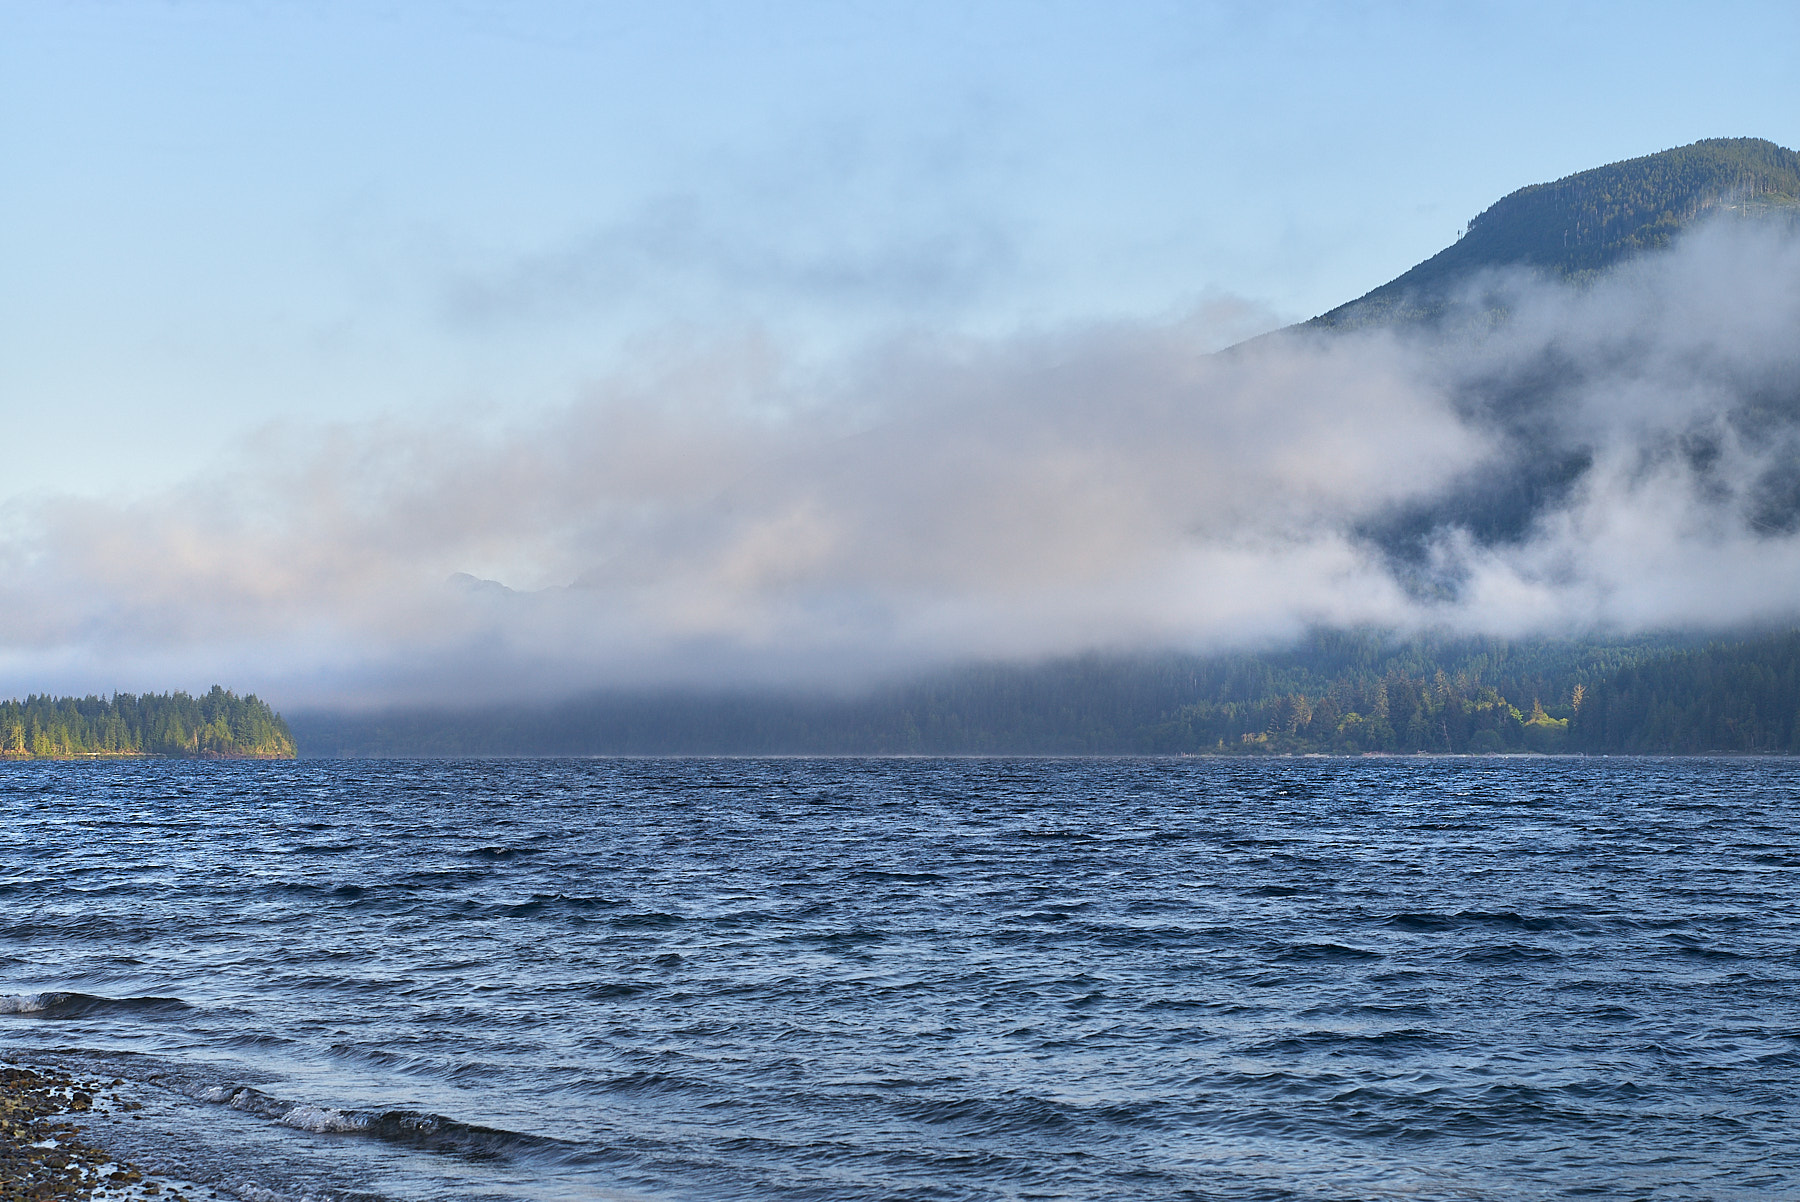 Cowichan Bay from Nixon Creek Recreation Site ©johncameron.ca